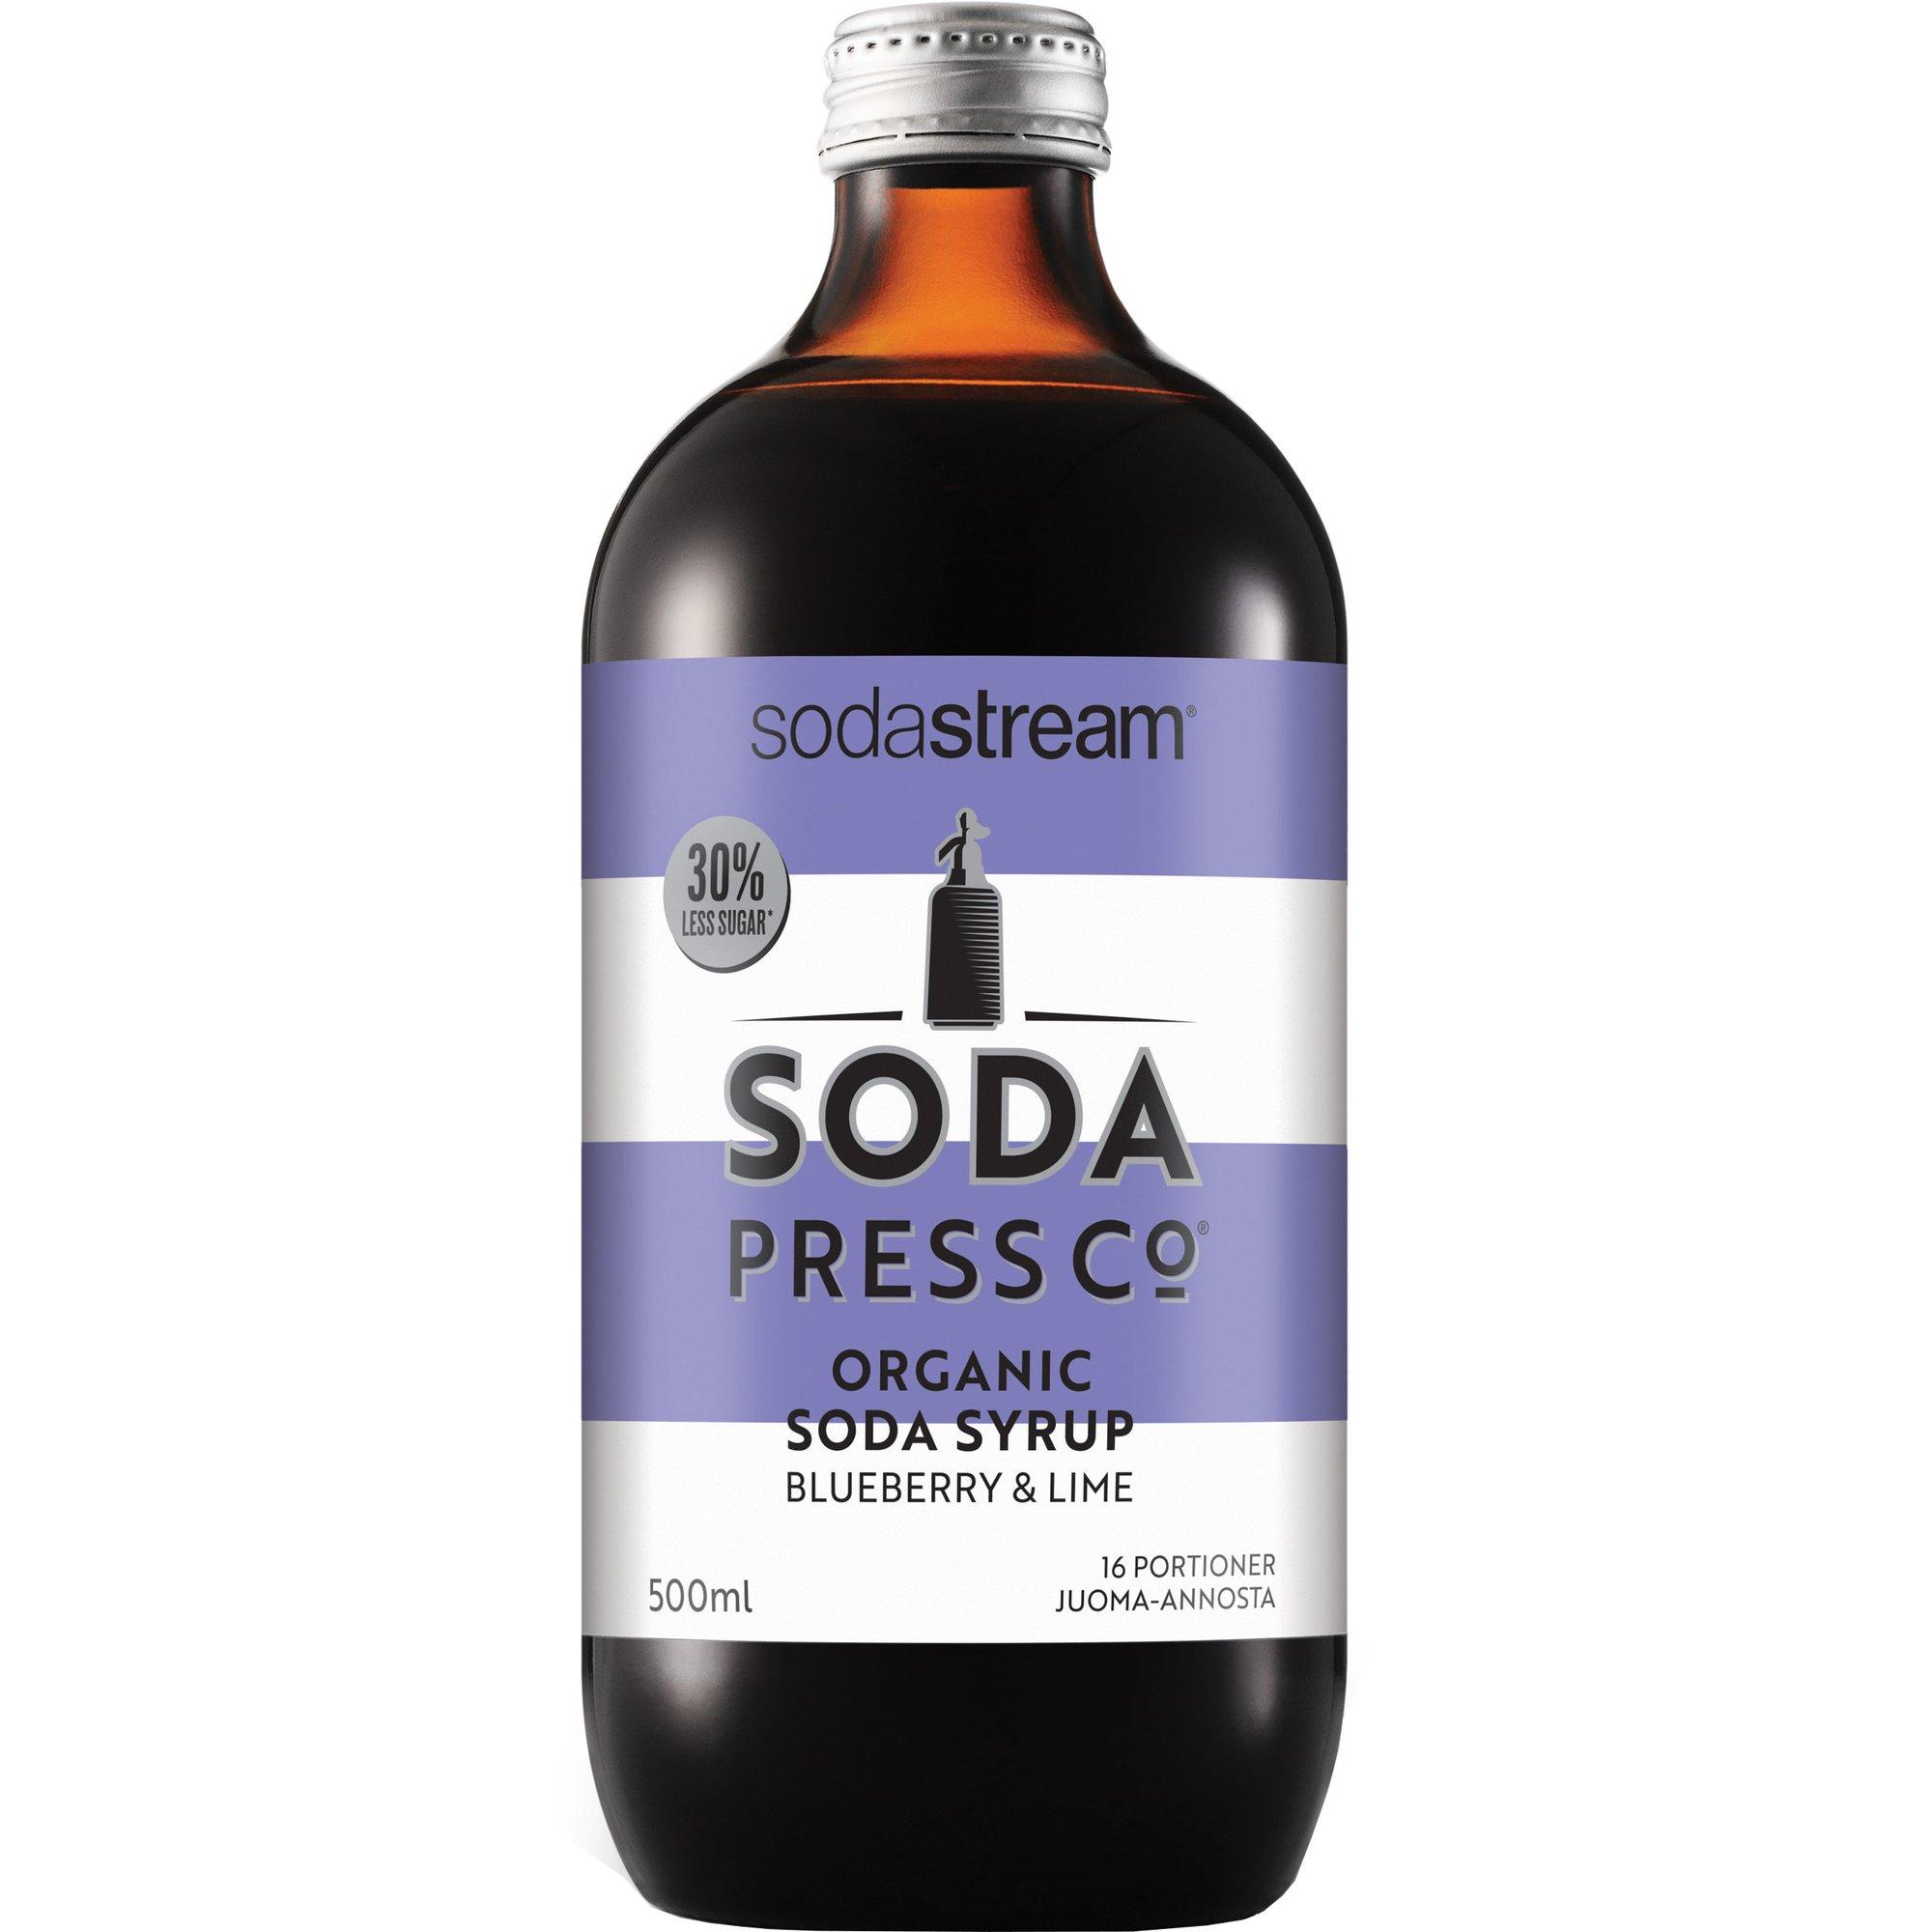 SodaStream Blueberry & Lime Ekologisk Smakkoncentrat